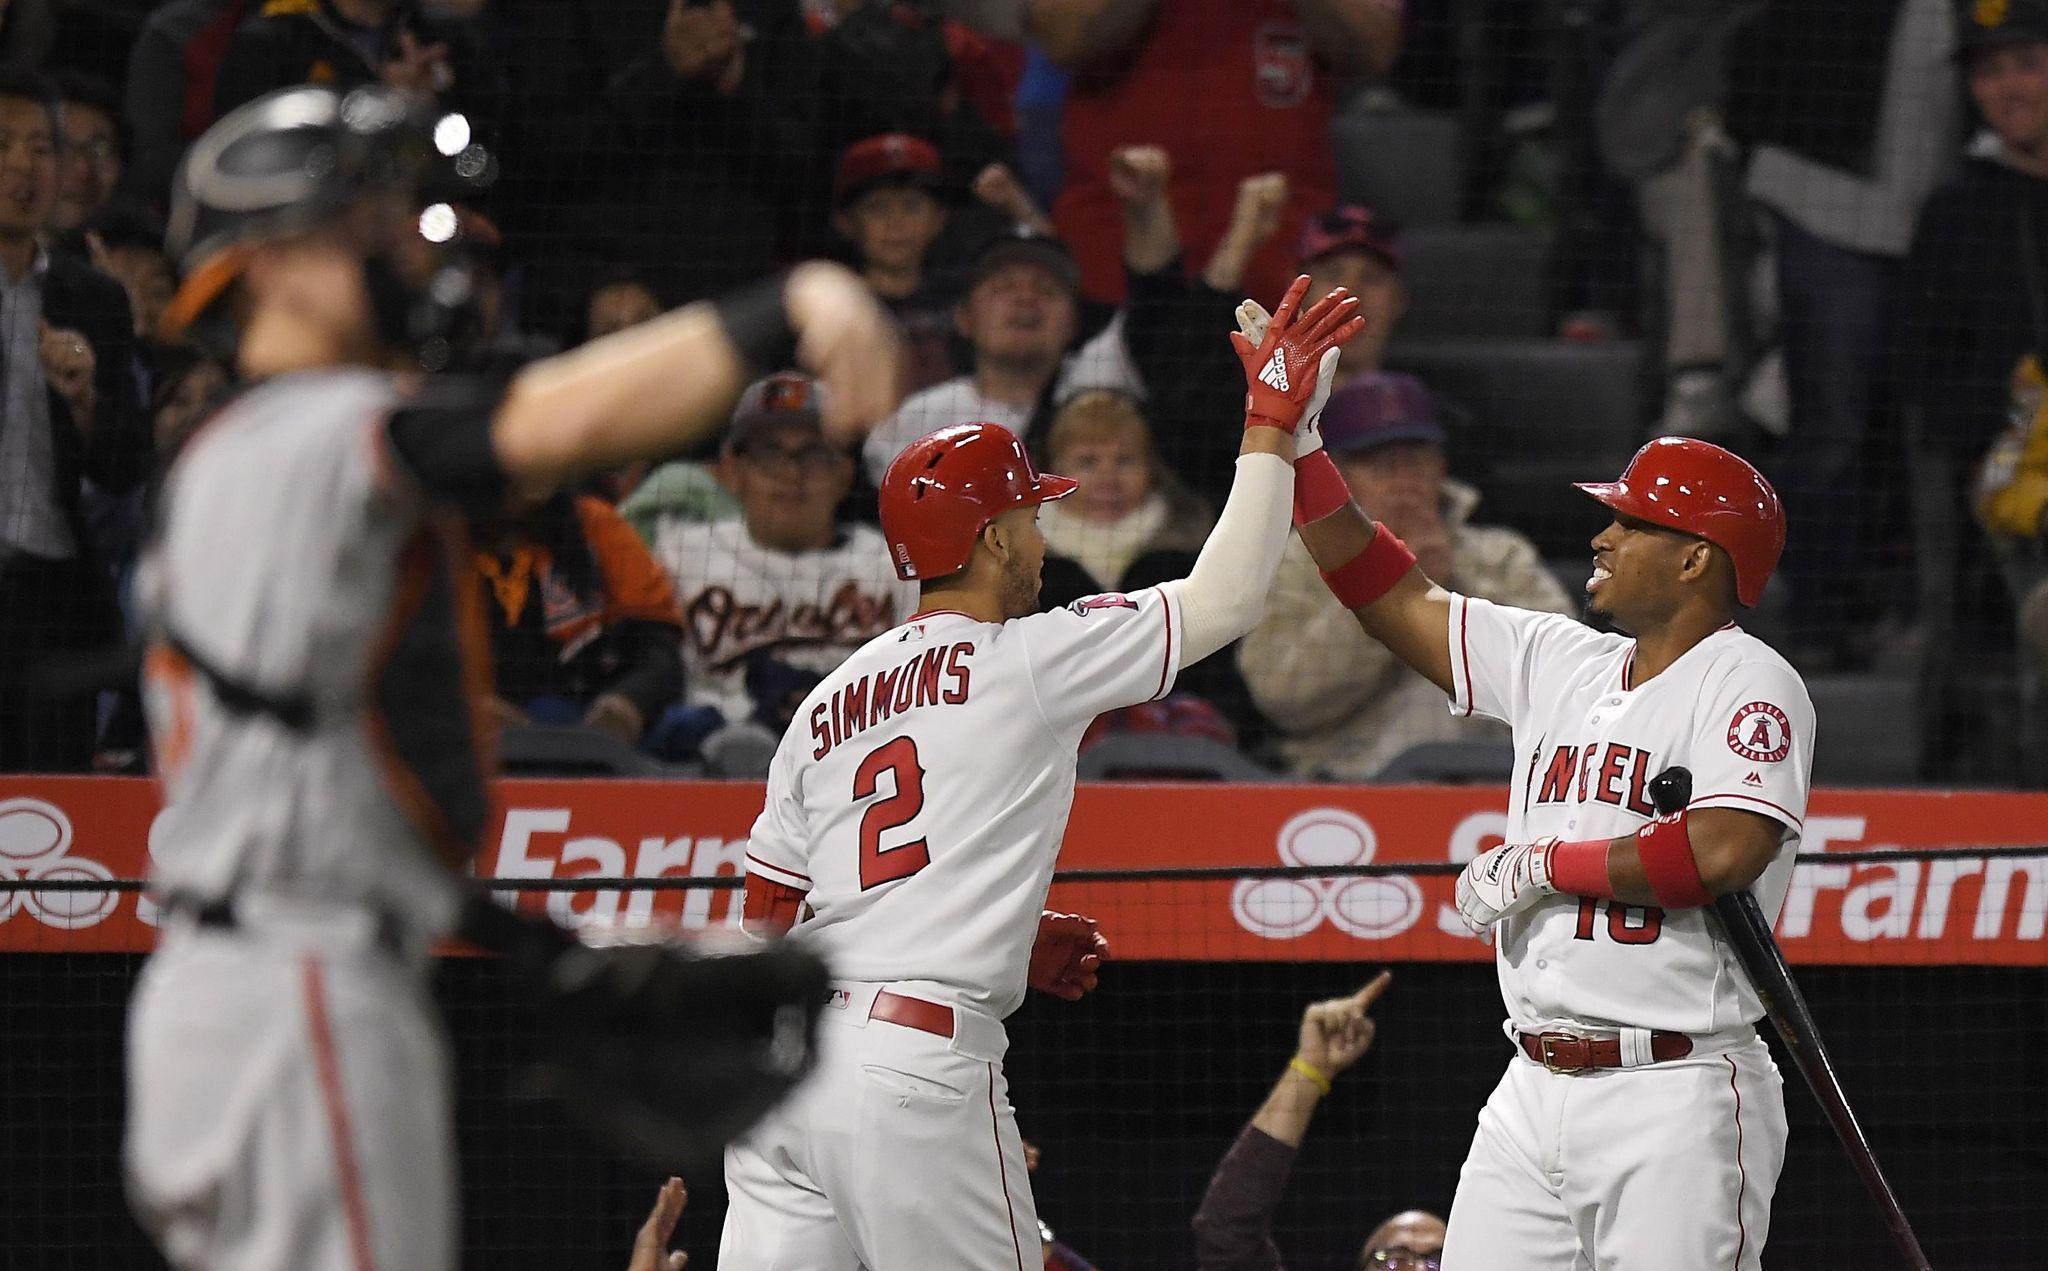 Orioles_angels_baseball_82358_s2048x1271